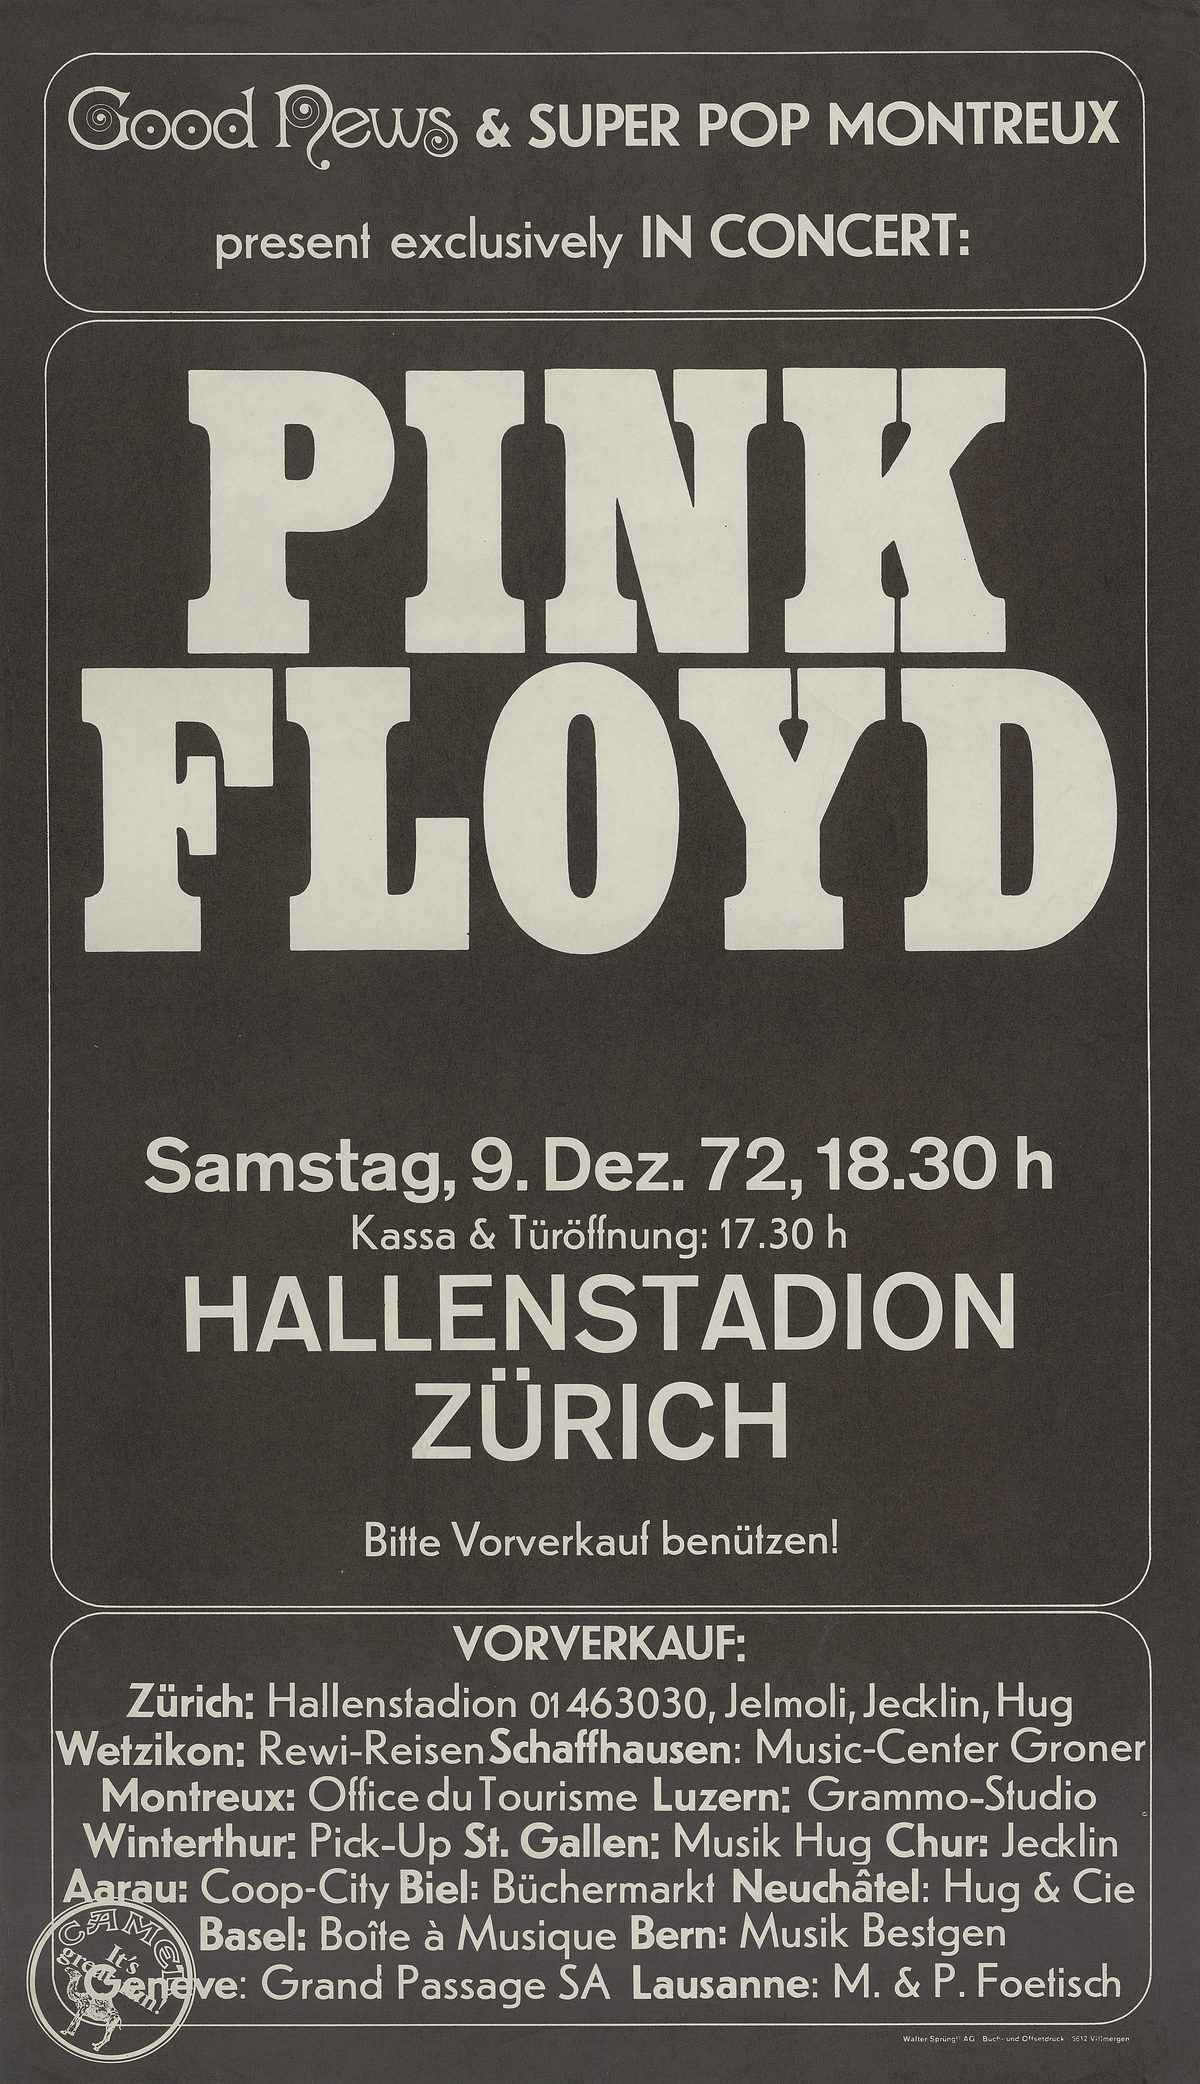 Good news Konzertplakat Pink Floyd Zürich hallenstadion Dezember 1972